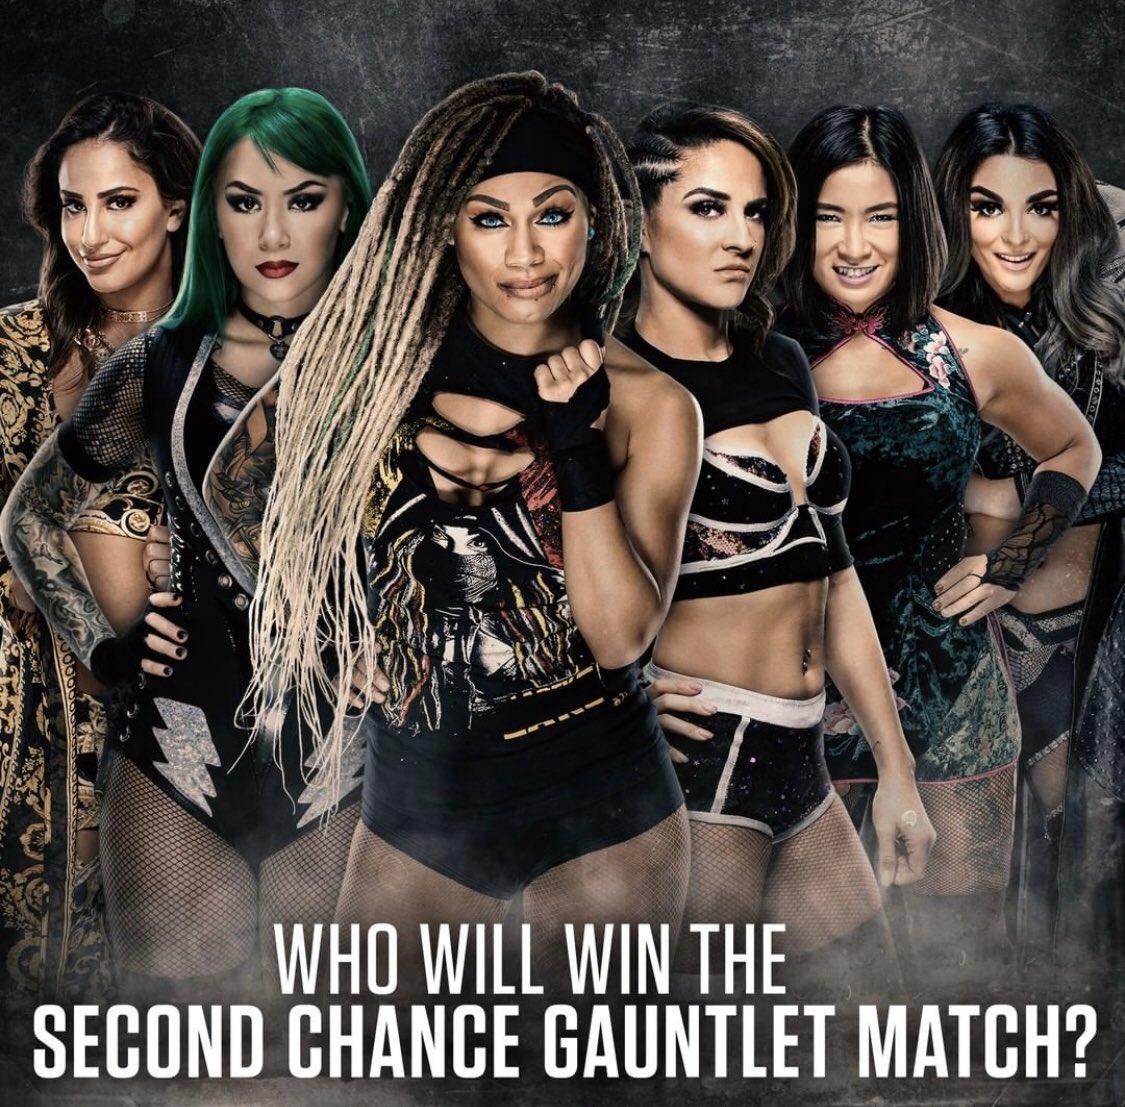 Tomorrow on @WWENXT Dakota has a warmup for her ladder match next week  #WWENXT #tooEasy<br>http://pic.twitter.com/6OXMiLGhZ4